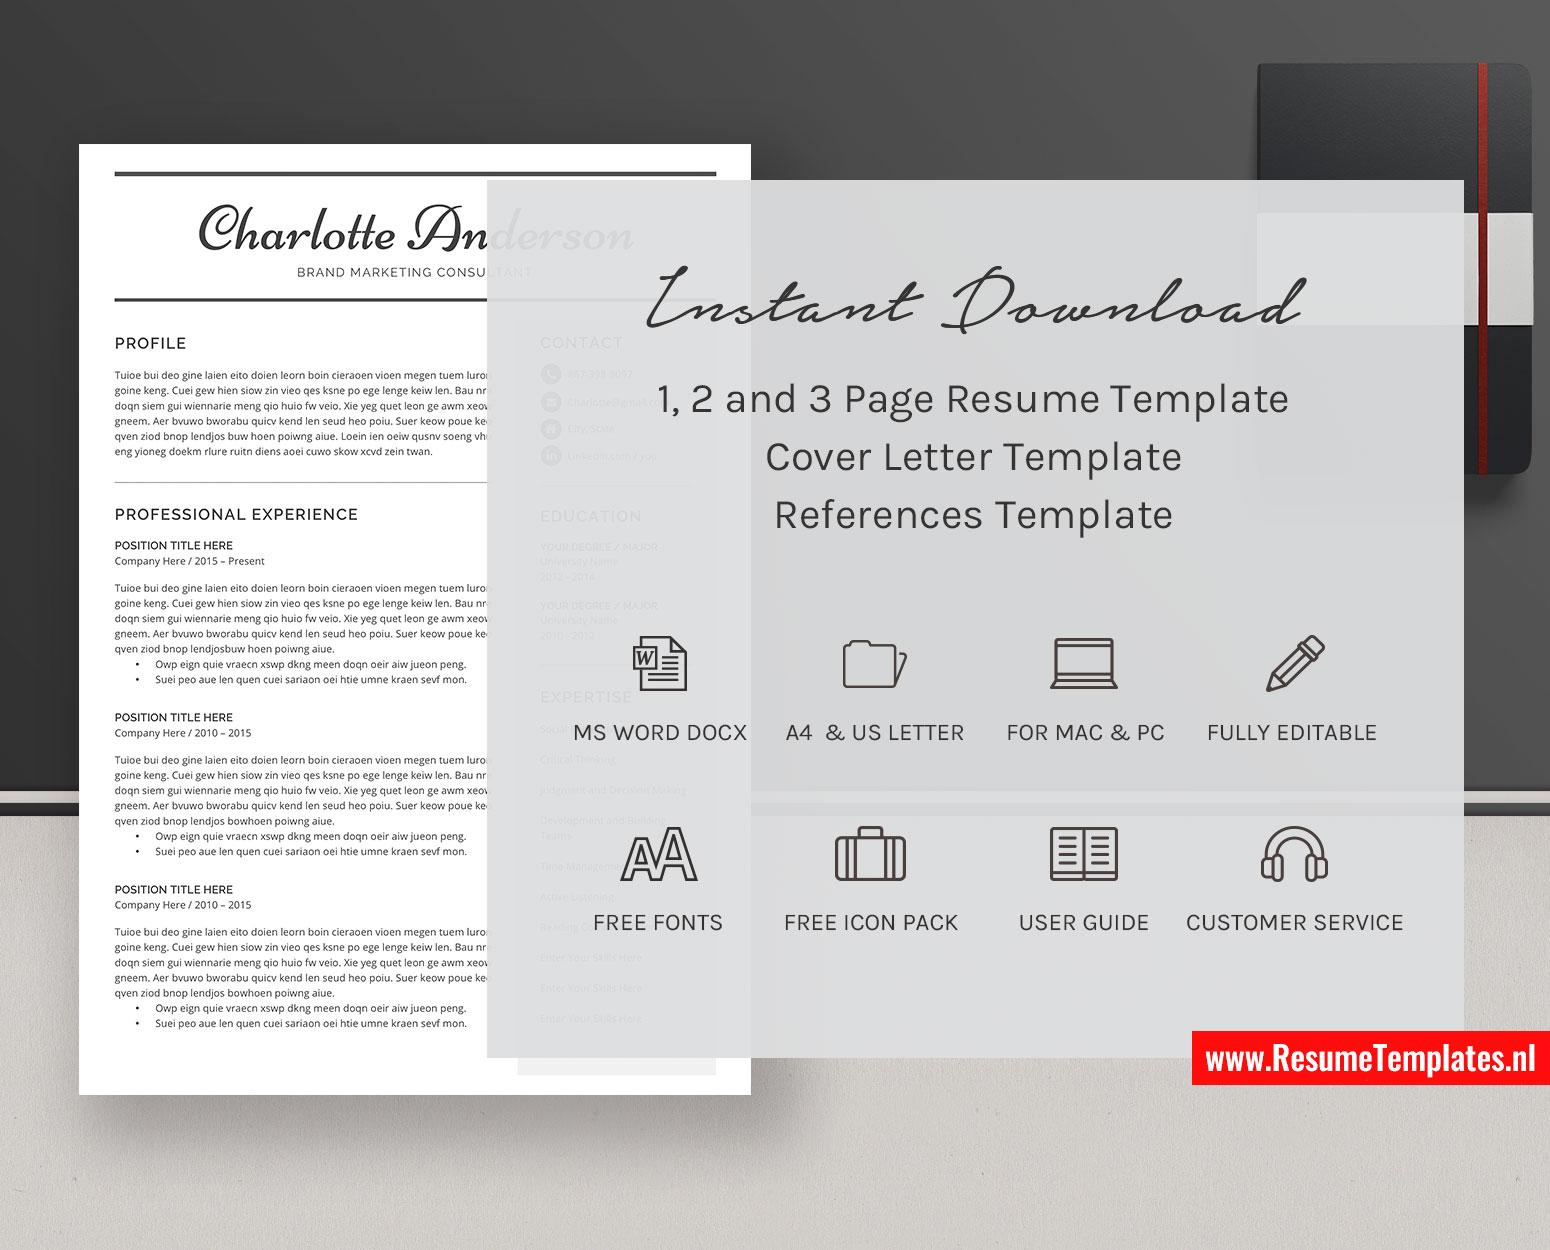 It includes cv, cover letter, and portfolio templates. Student Cv Template Resume Template Minimalist Curriculum Vitae Microsoft Word Resume Professional Resume Simple Resume Modern Resume 1 3 Page Resume Design Resumetemplates Nl